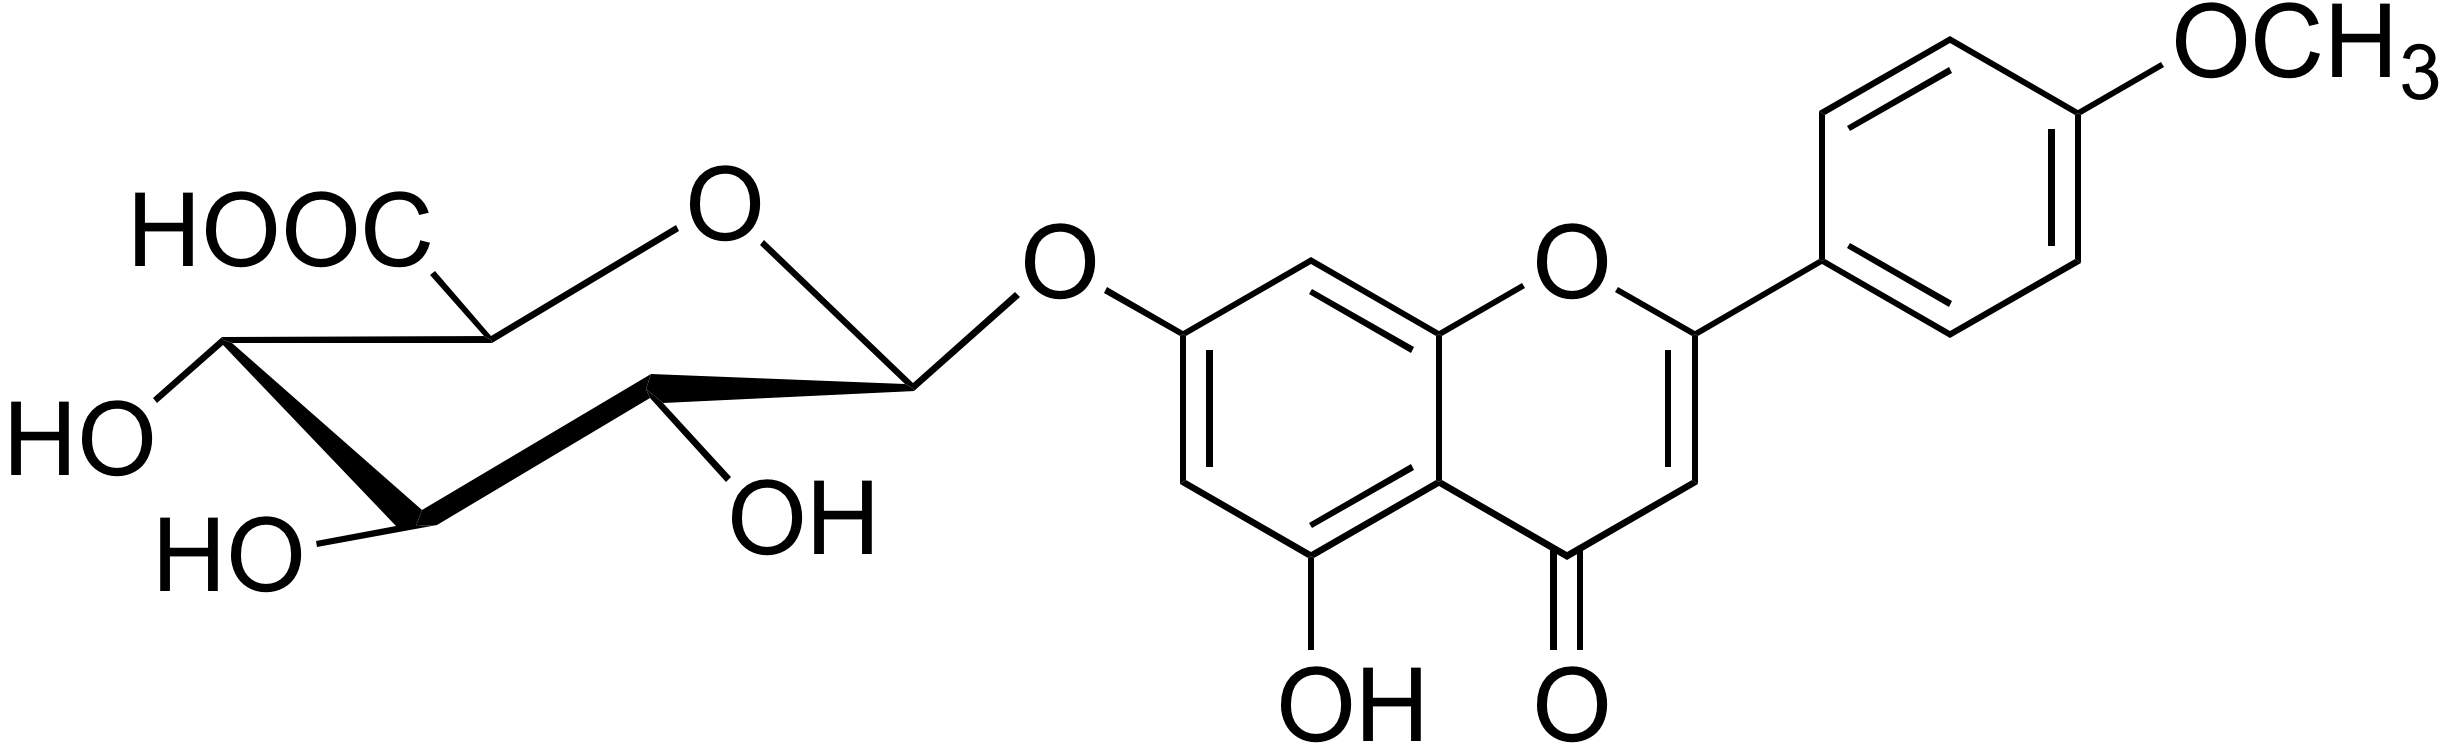 Acacetin7-glucuronide